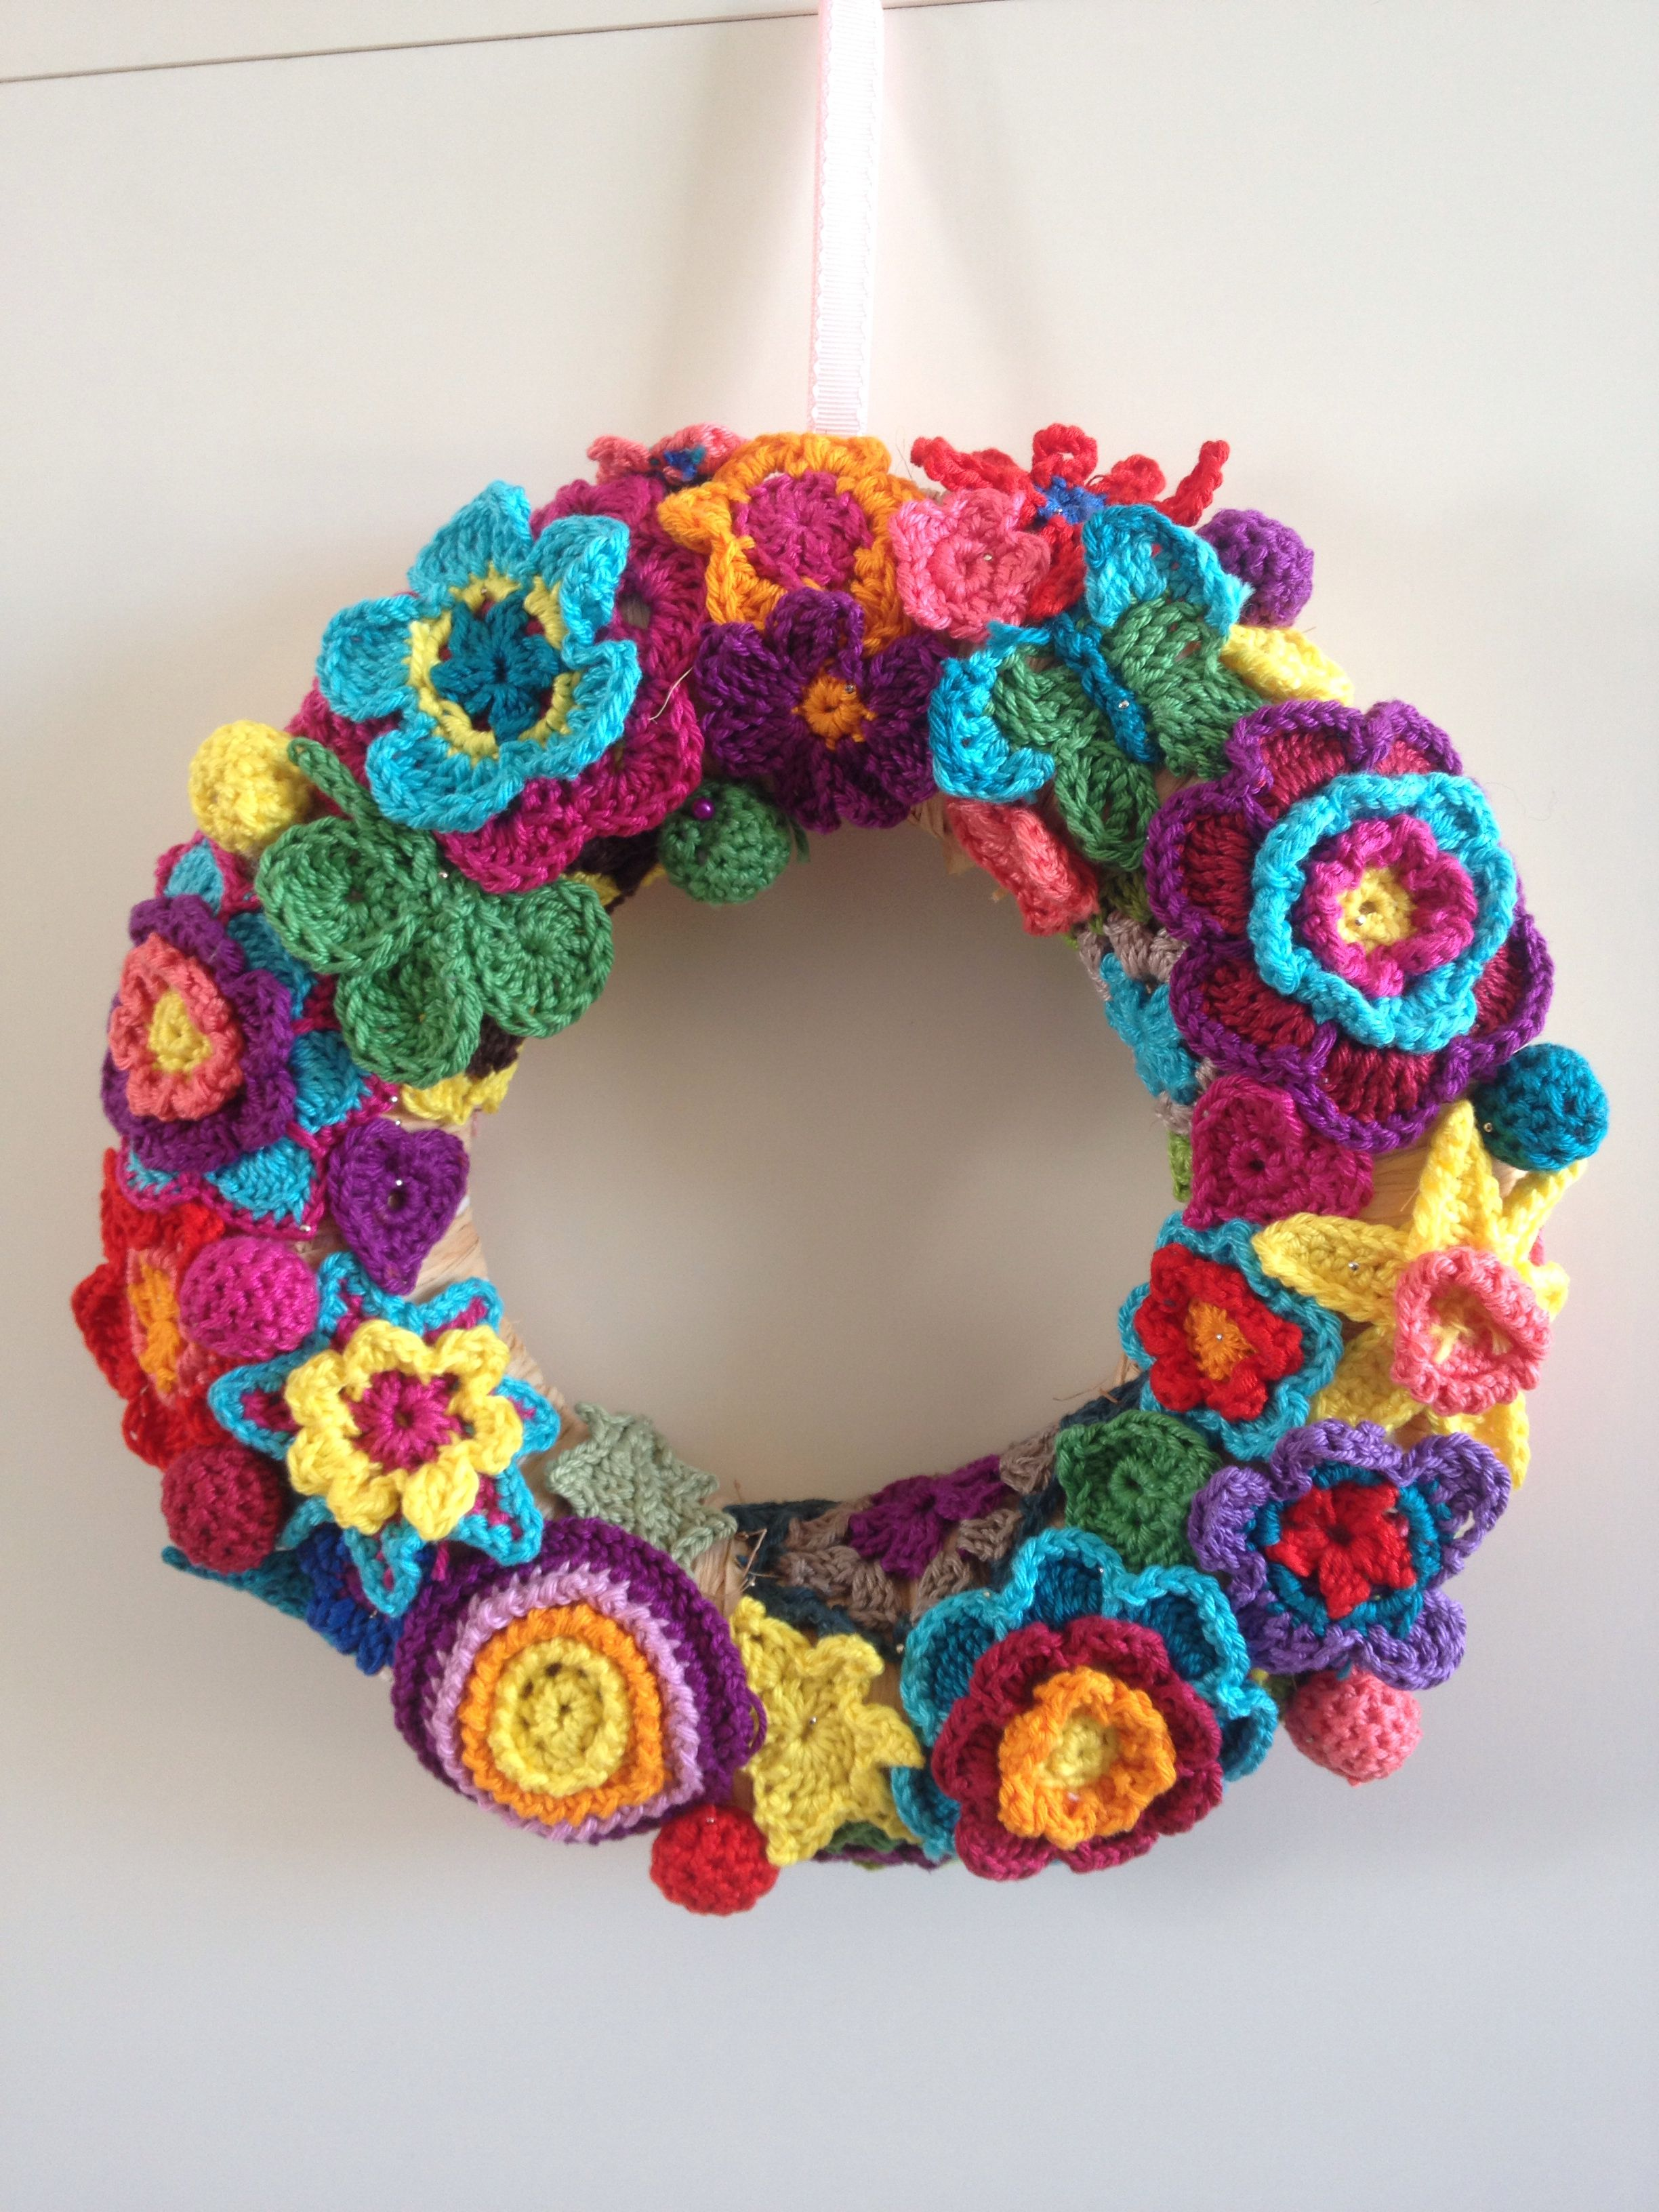 Blumenkranz (crochet, häkeln) flower crochet wreath | Türkranz ...